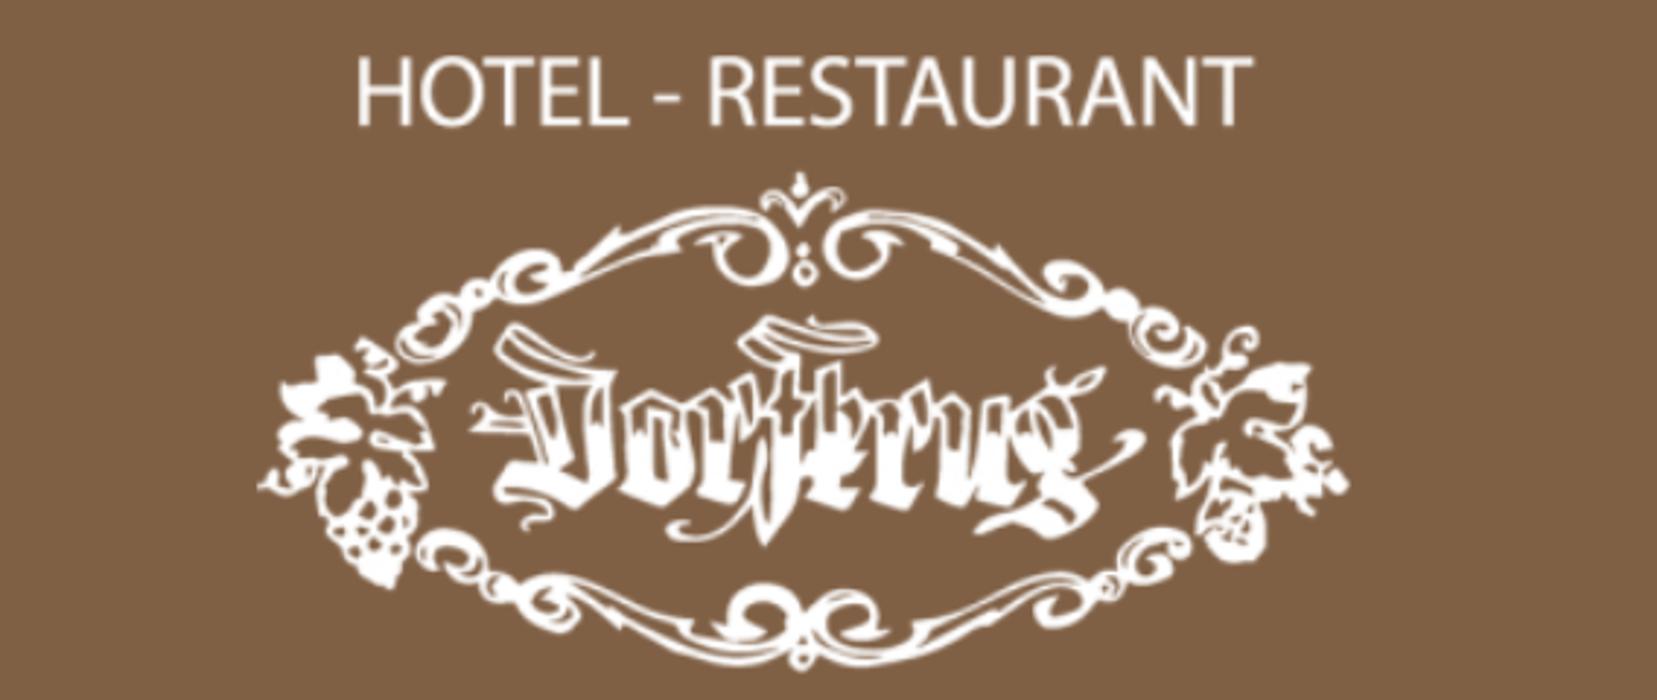 Bild zu Hotel Restaurant Dorfkrug in Mandelbachtal